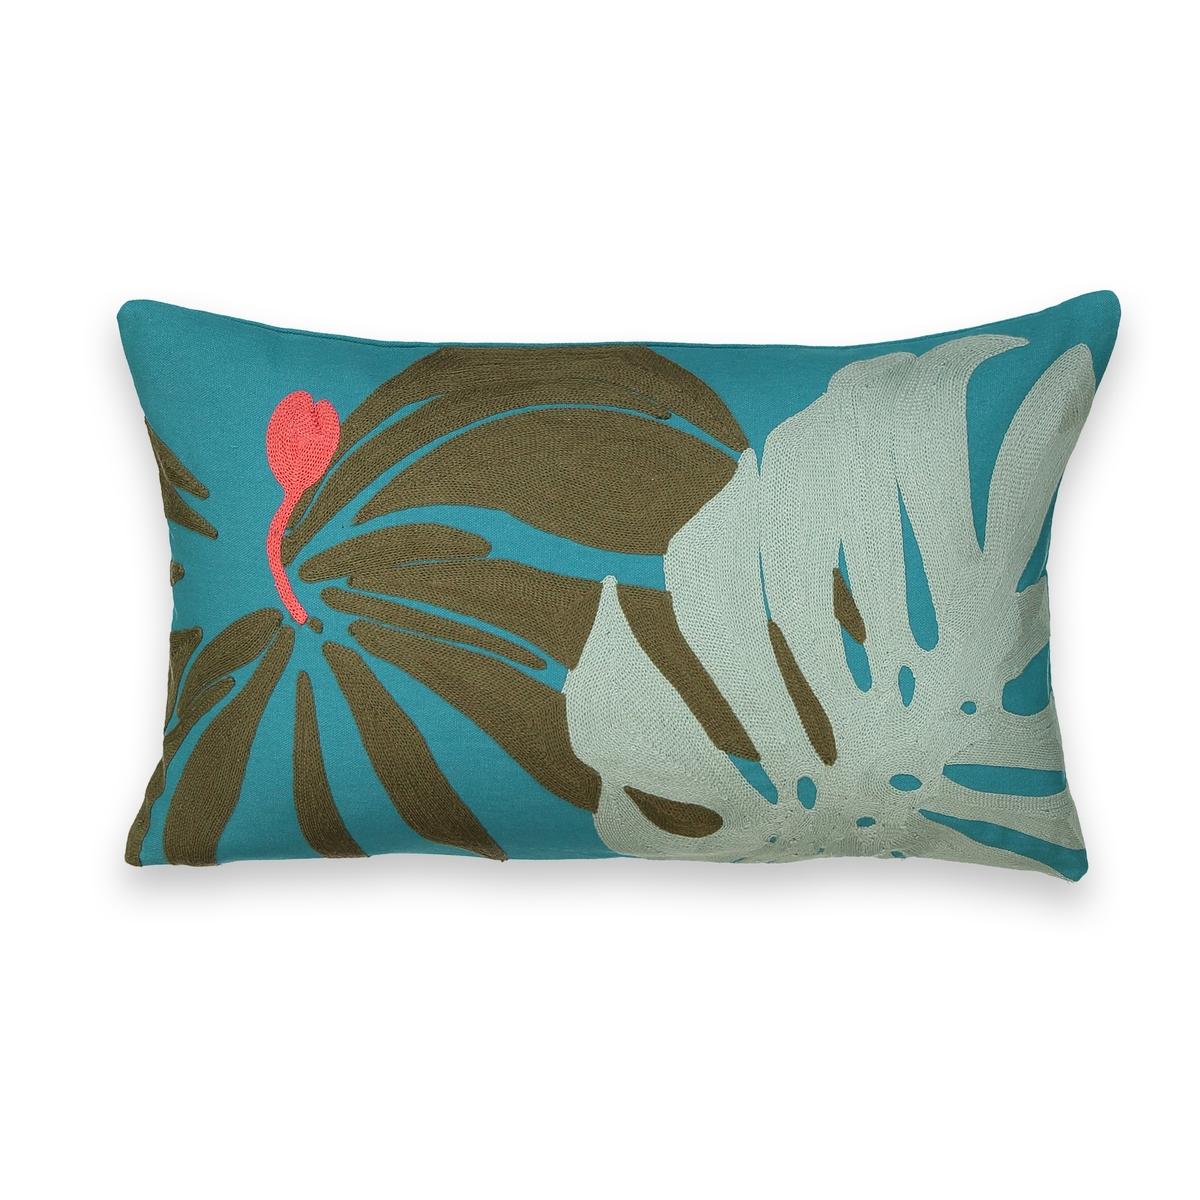 Чехол на подушку BRAZILIA с вышивкой